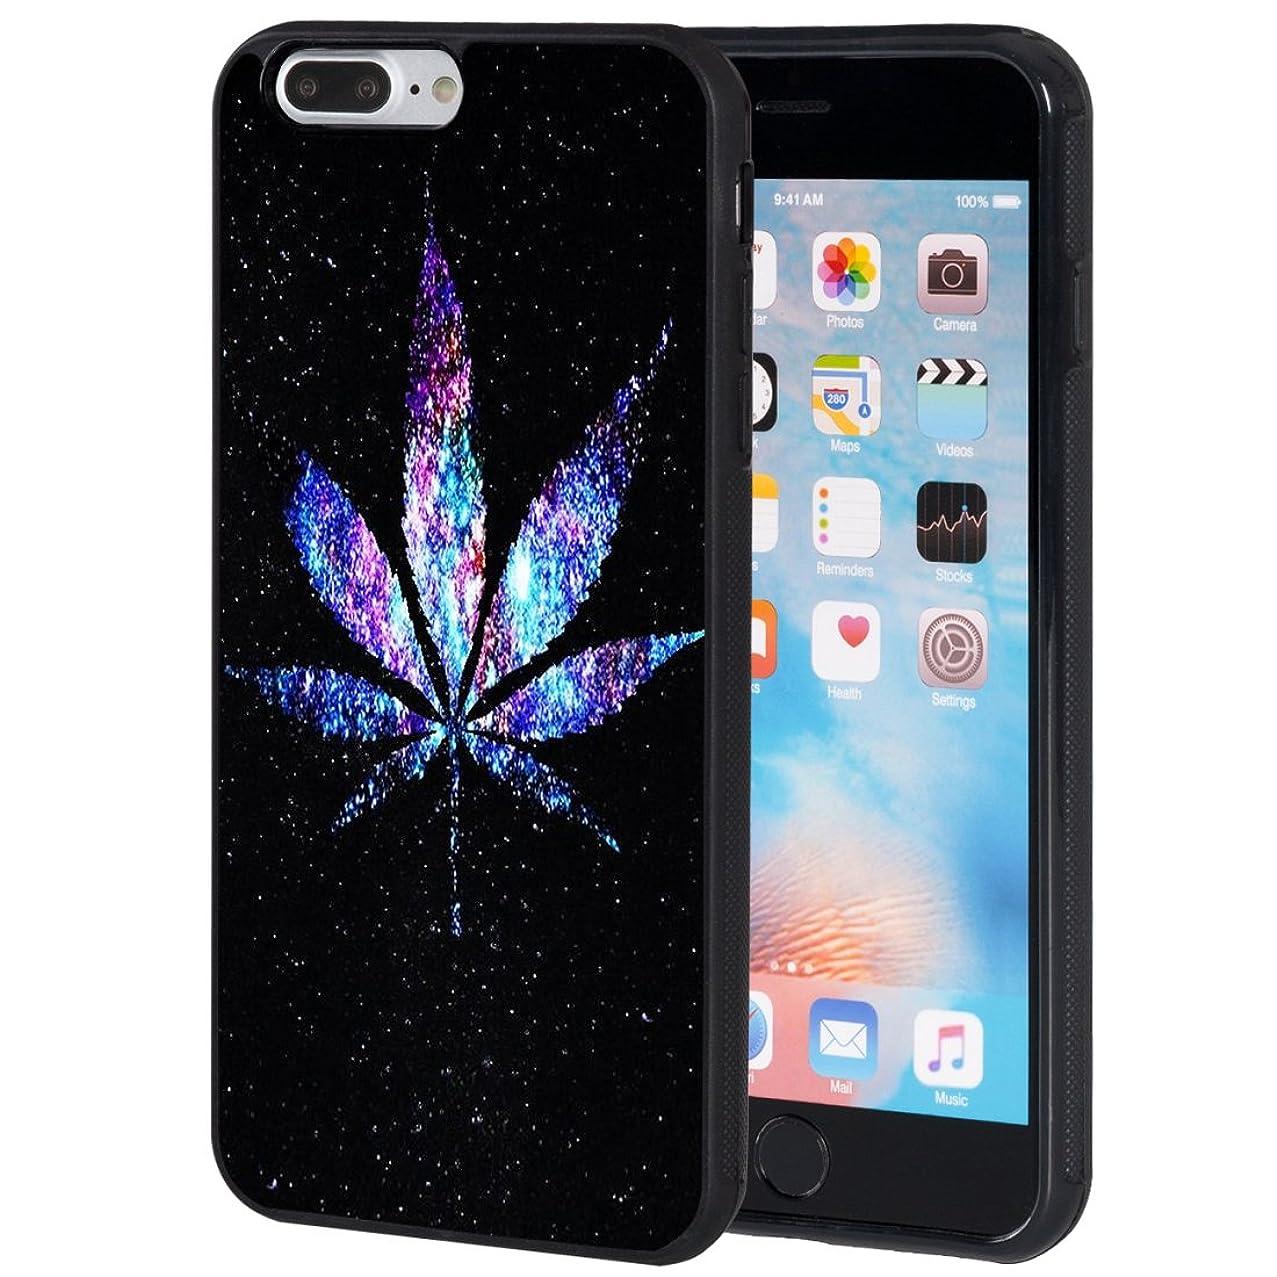 iPhone 7 Plus Case,iPhone 8 Plus Case,AIRWEE Slim Anti-Scratch Shockproof Silicone TPU Back Protective Cover Case for Apple iPhone 8 Plus/iPhone 7 Plus 5.5 Inch,Galaxy Weed Leaf